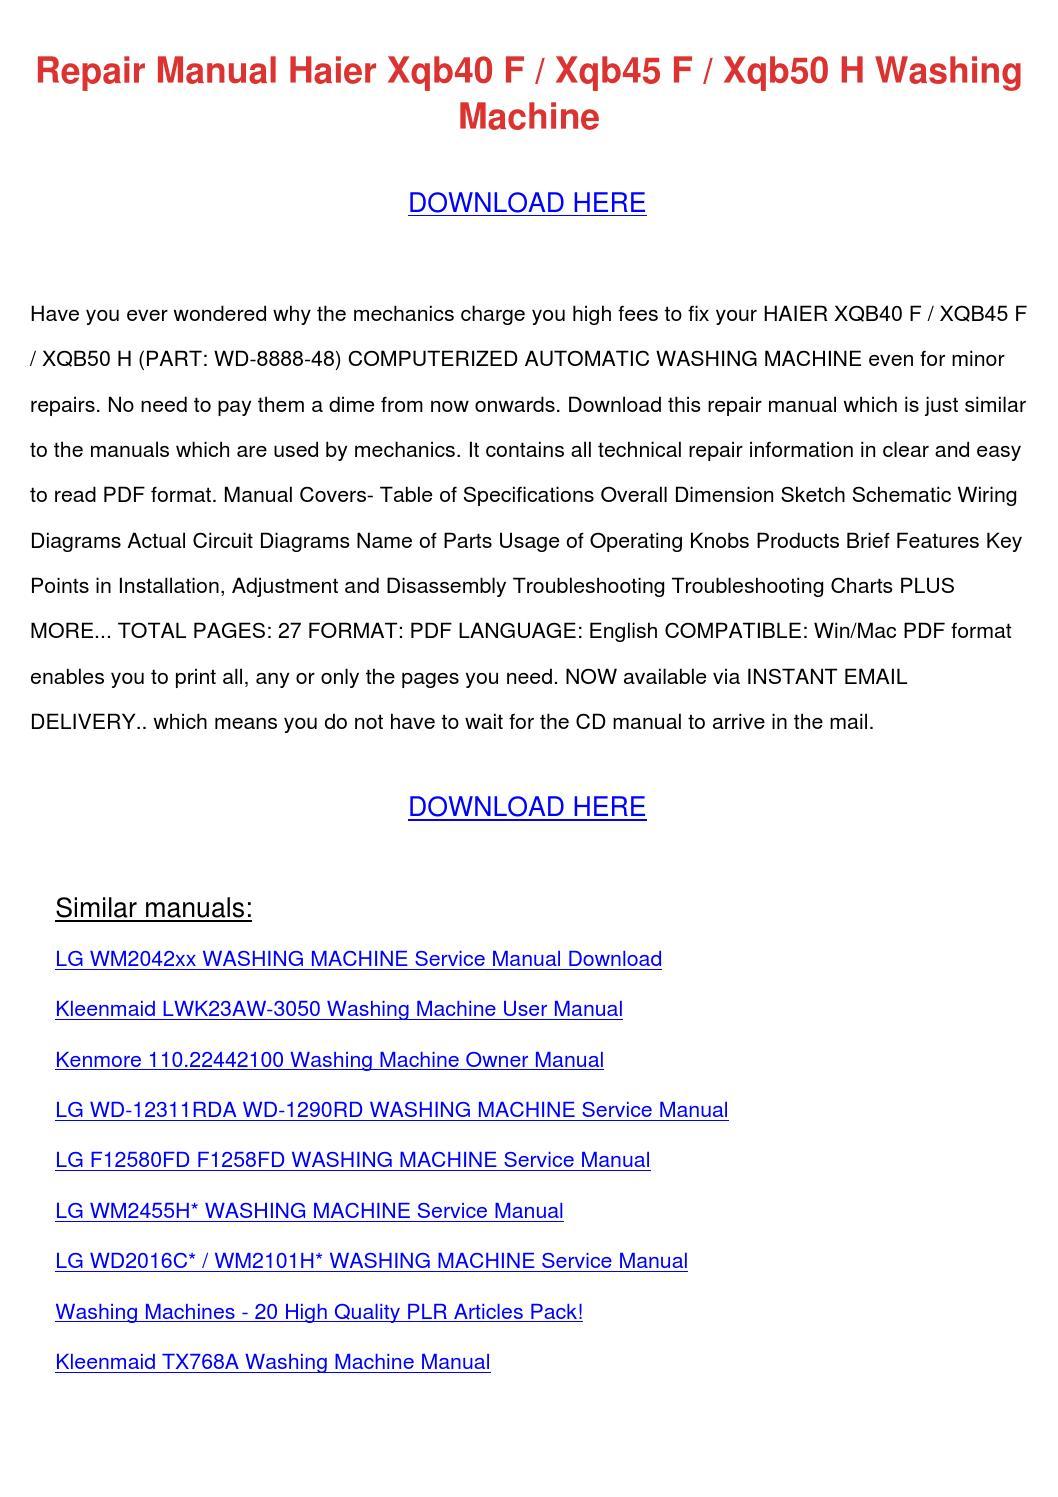 hight resolution of repair manual haier xqb40 f xqb45 f xqb50 h w